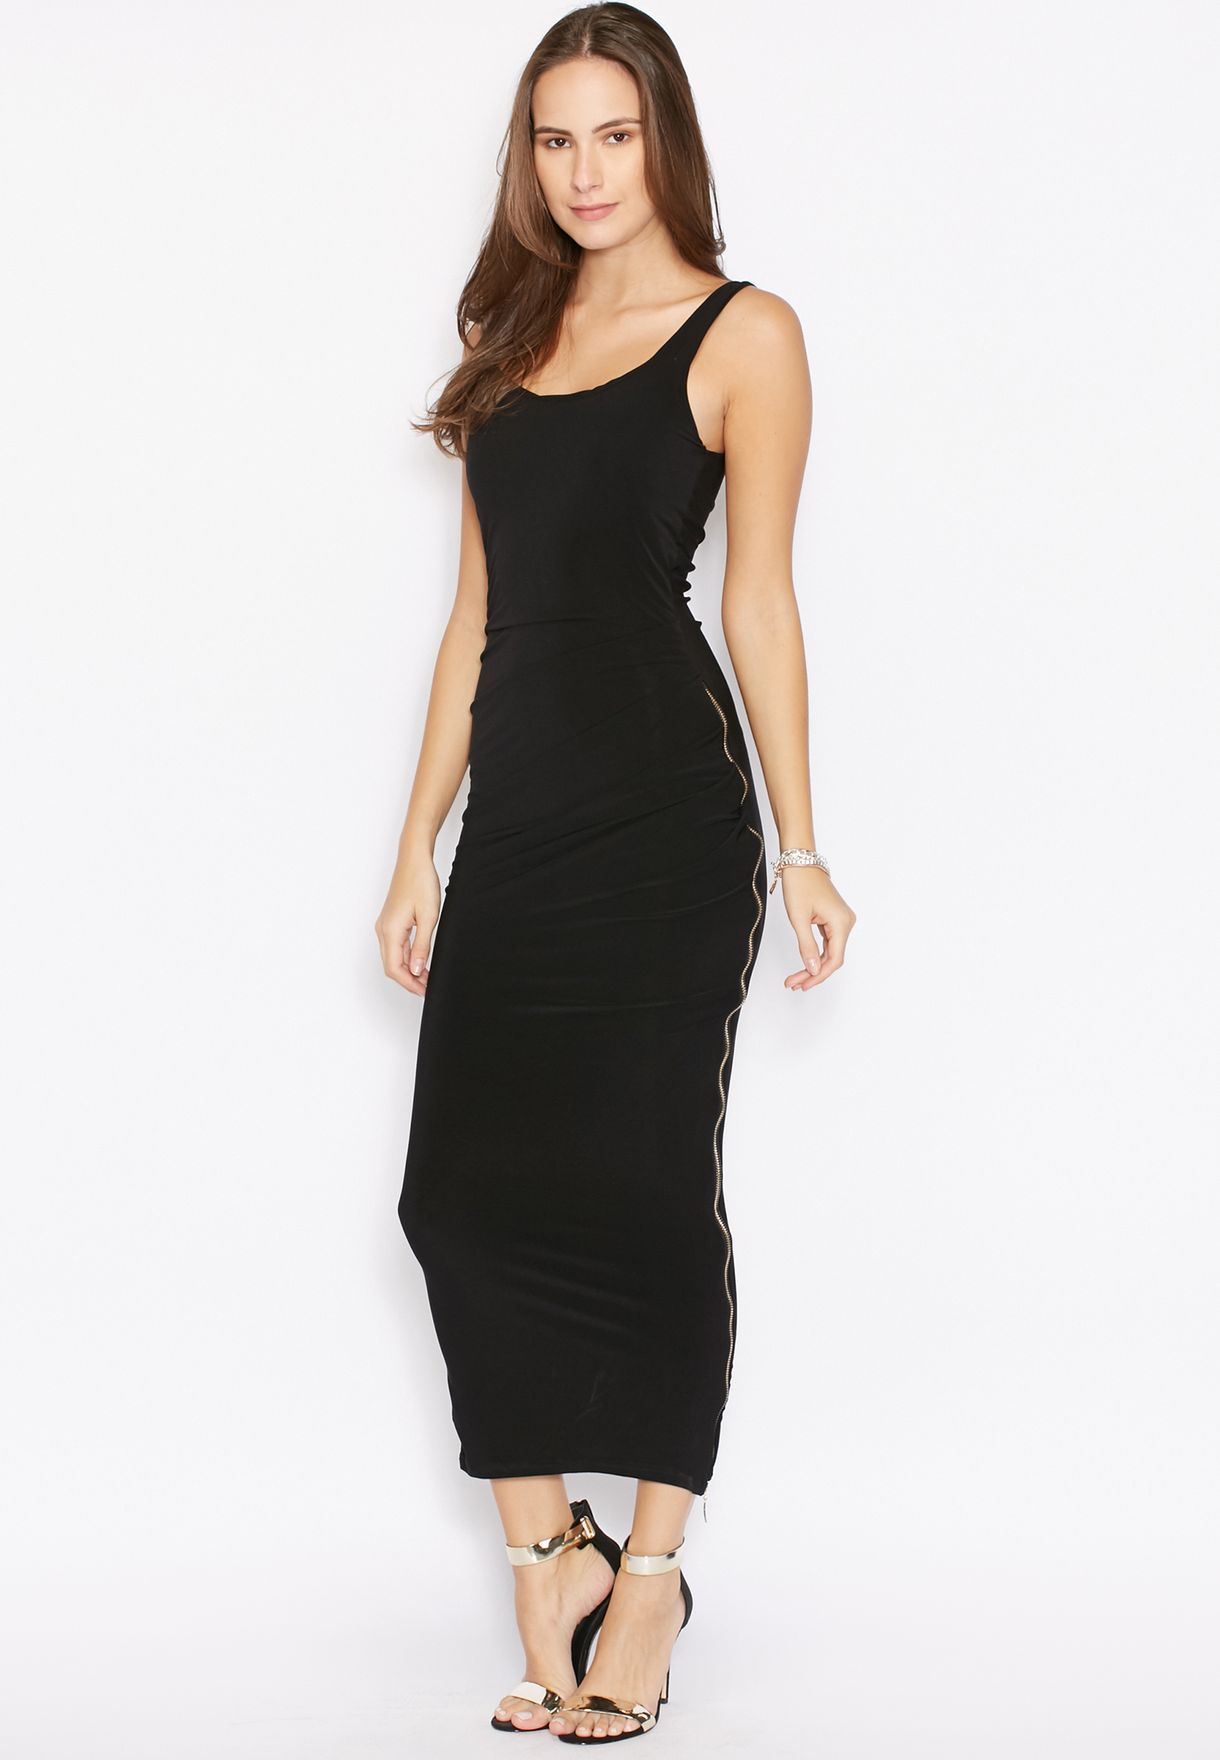 71b6fc962a9 Shop Ginger Basics black Side Zip Maxi Dress for Women in Qatar ...